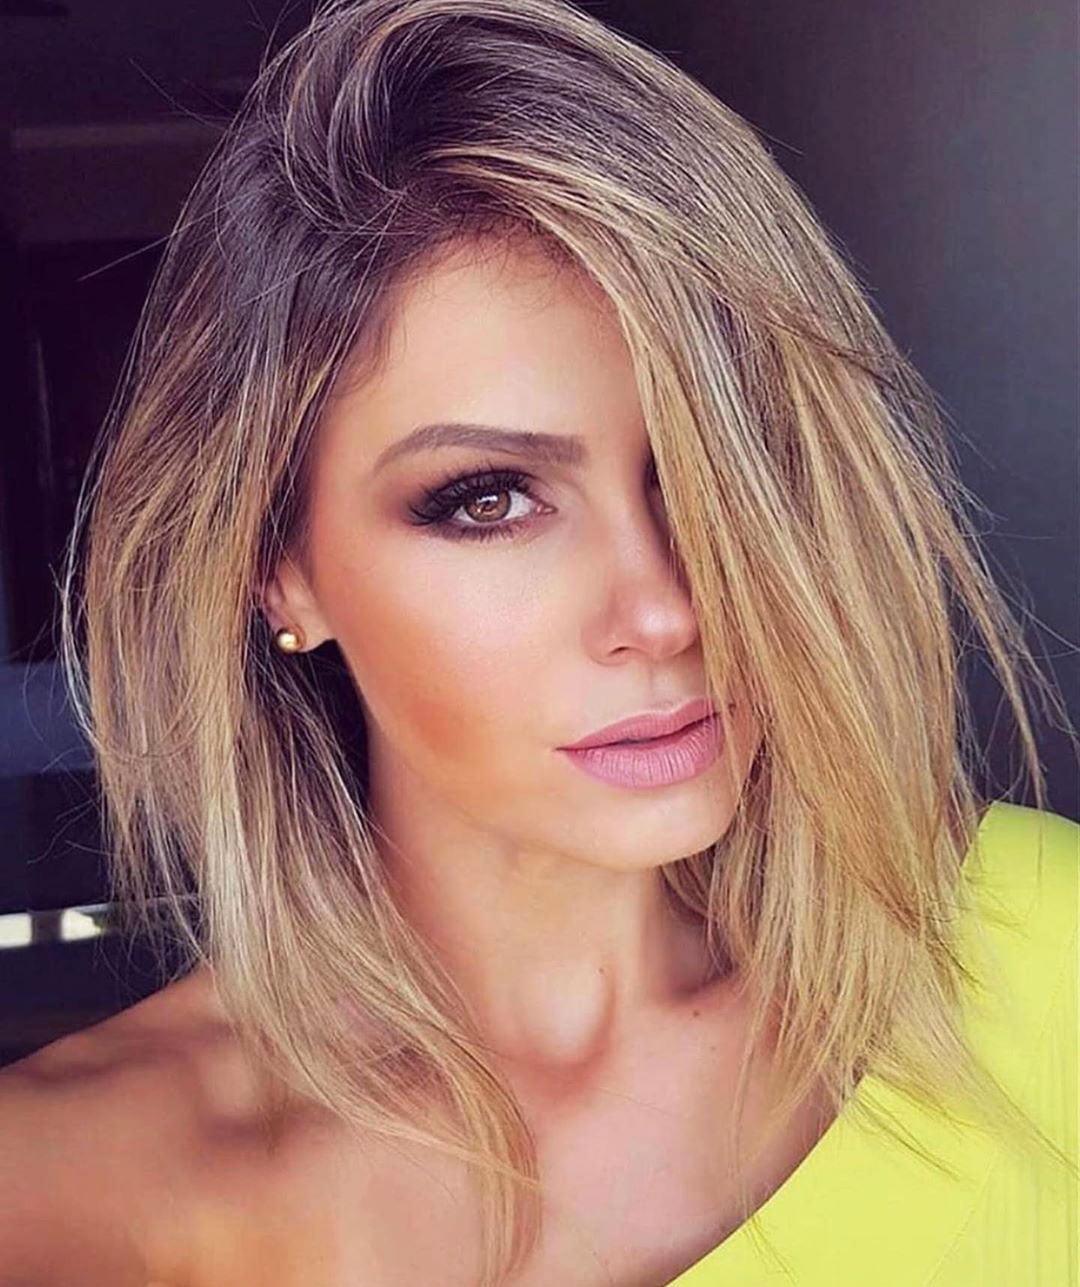 hair styles for short hair (12)